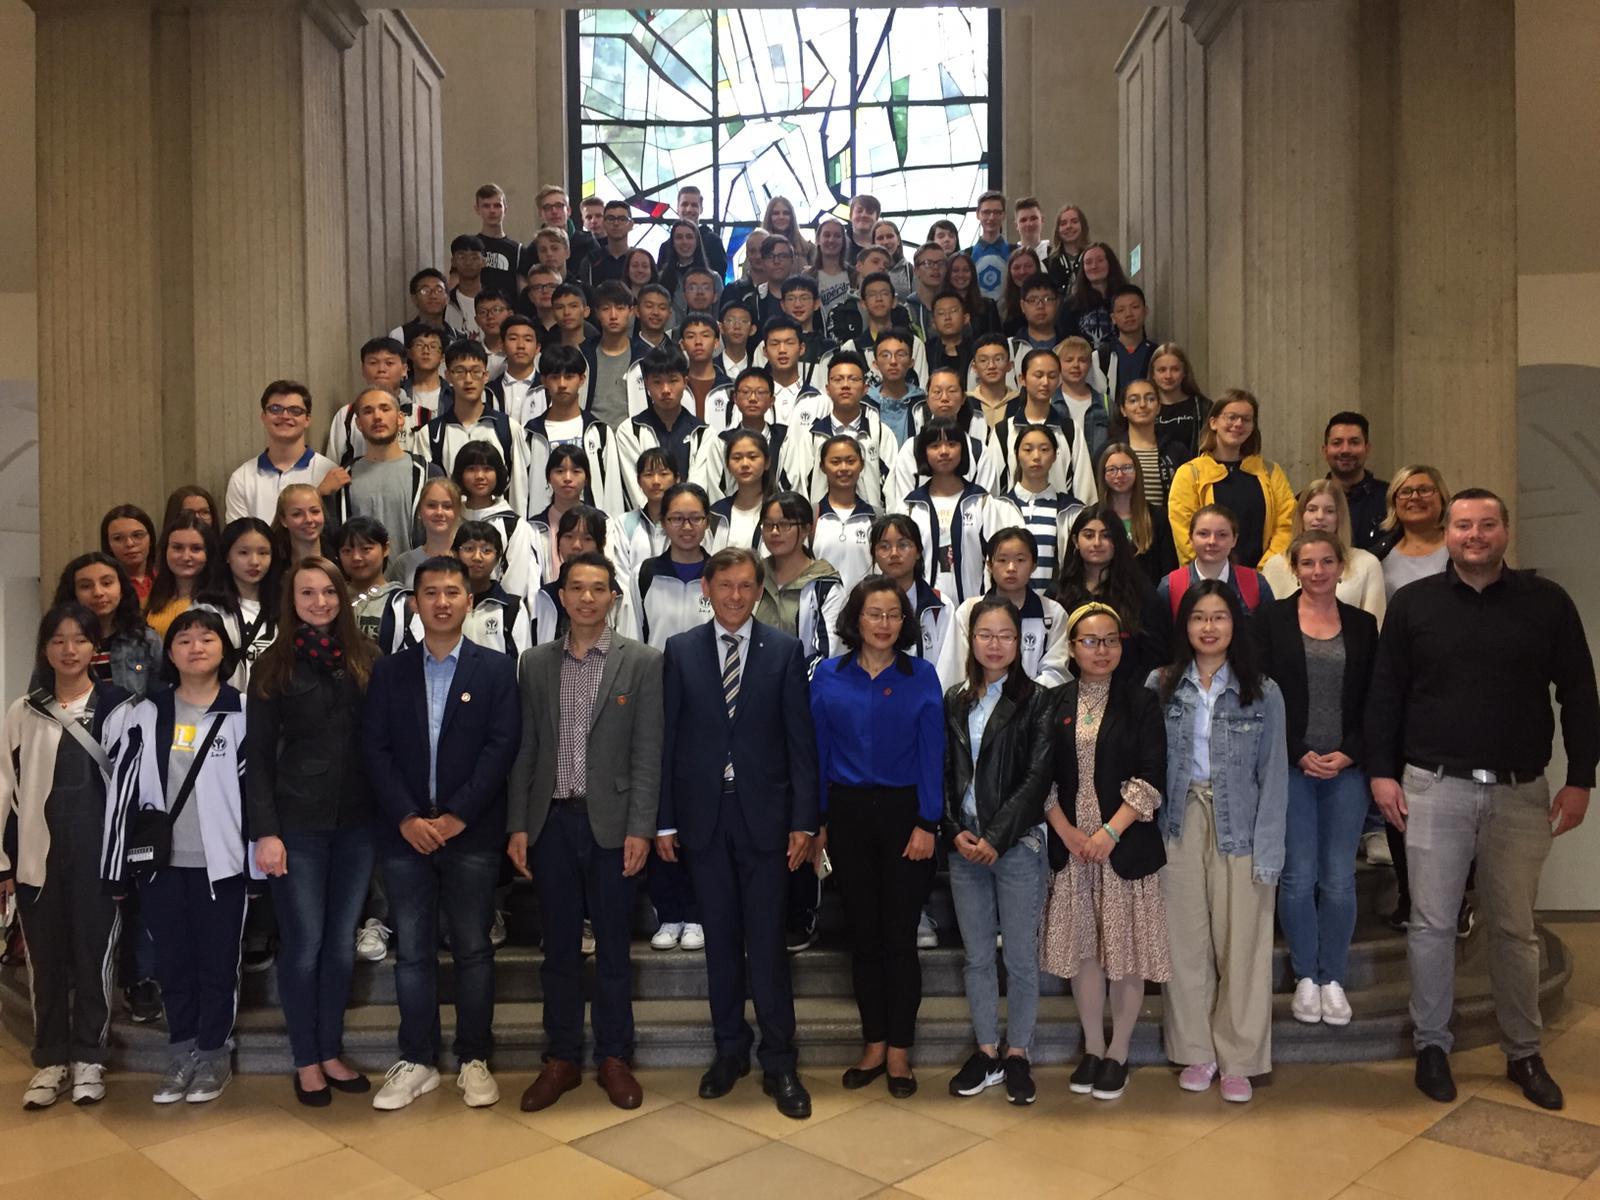 China meets Germany – Ein Erfahrungsbericht zum Schüleraustausch